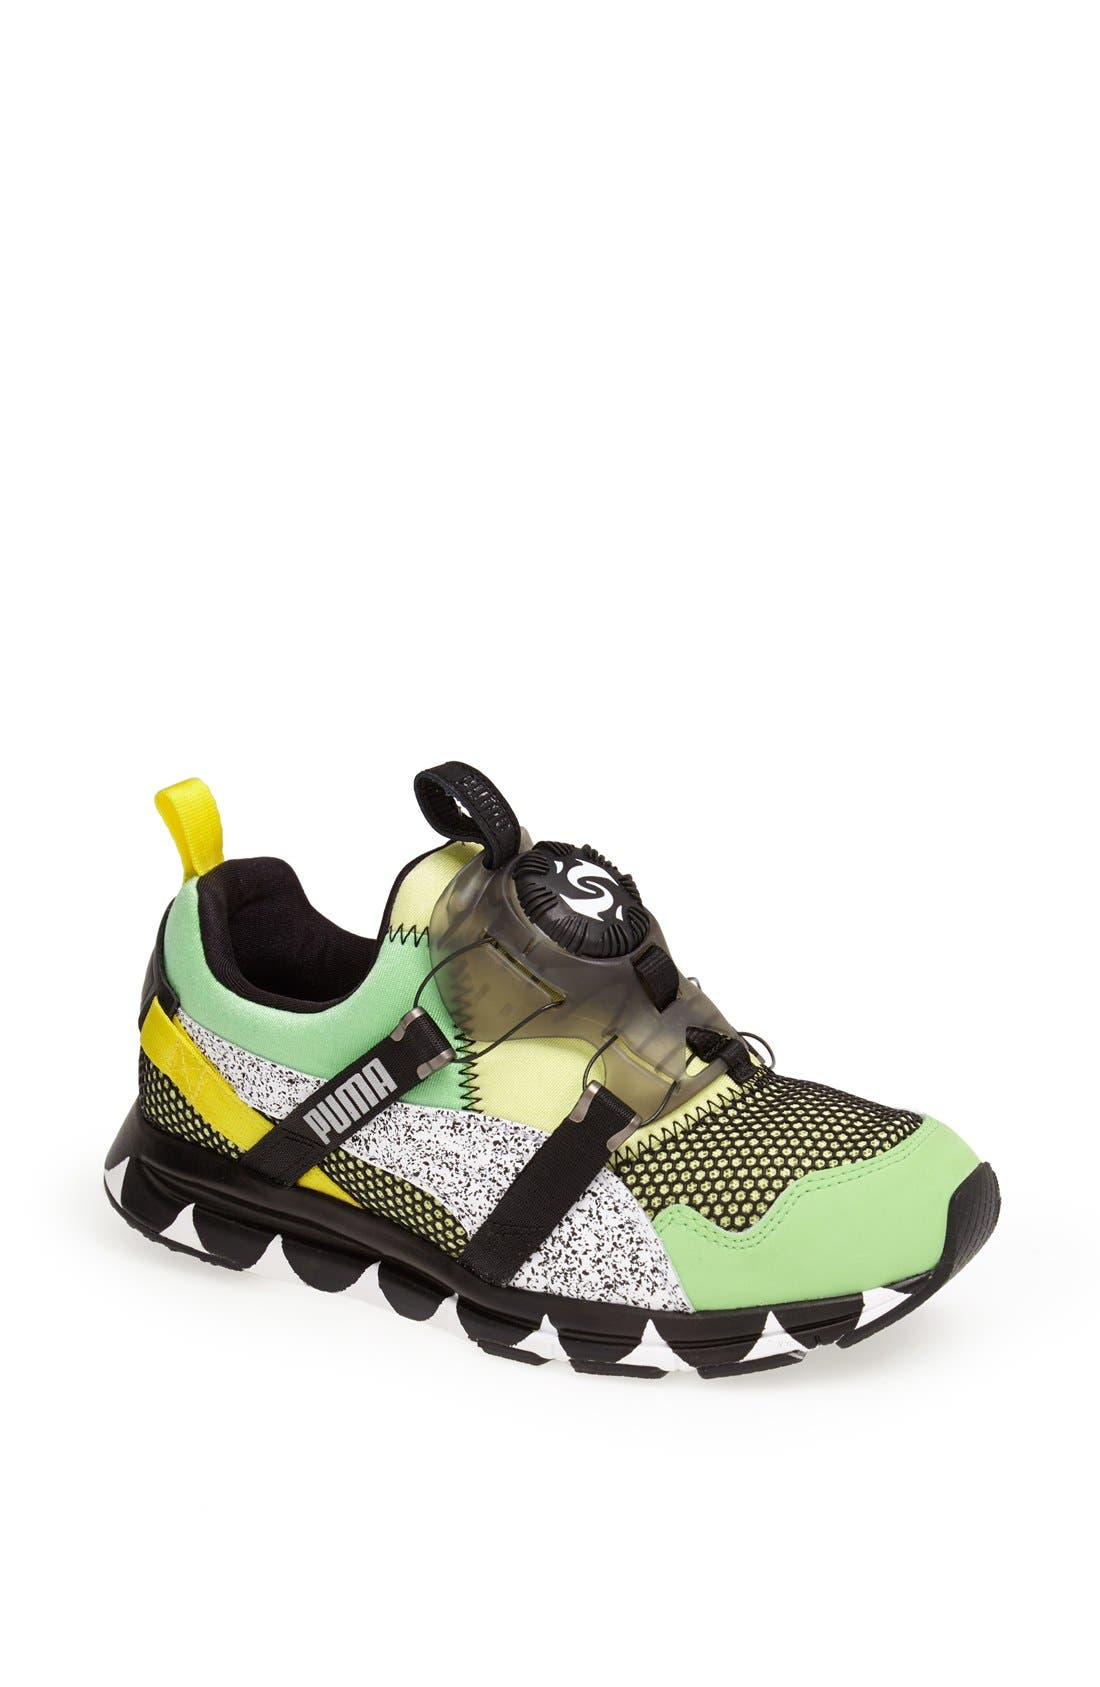 PUMA, 'Disc - Solange' Sneaker, Main thumbnail 1, color, 020